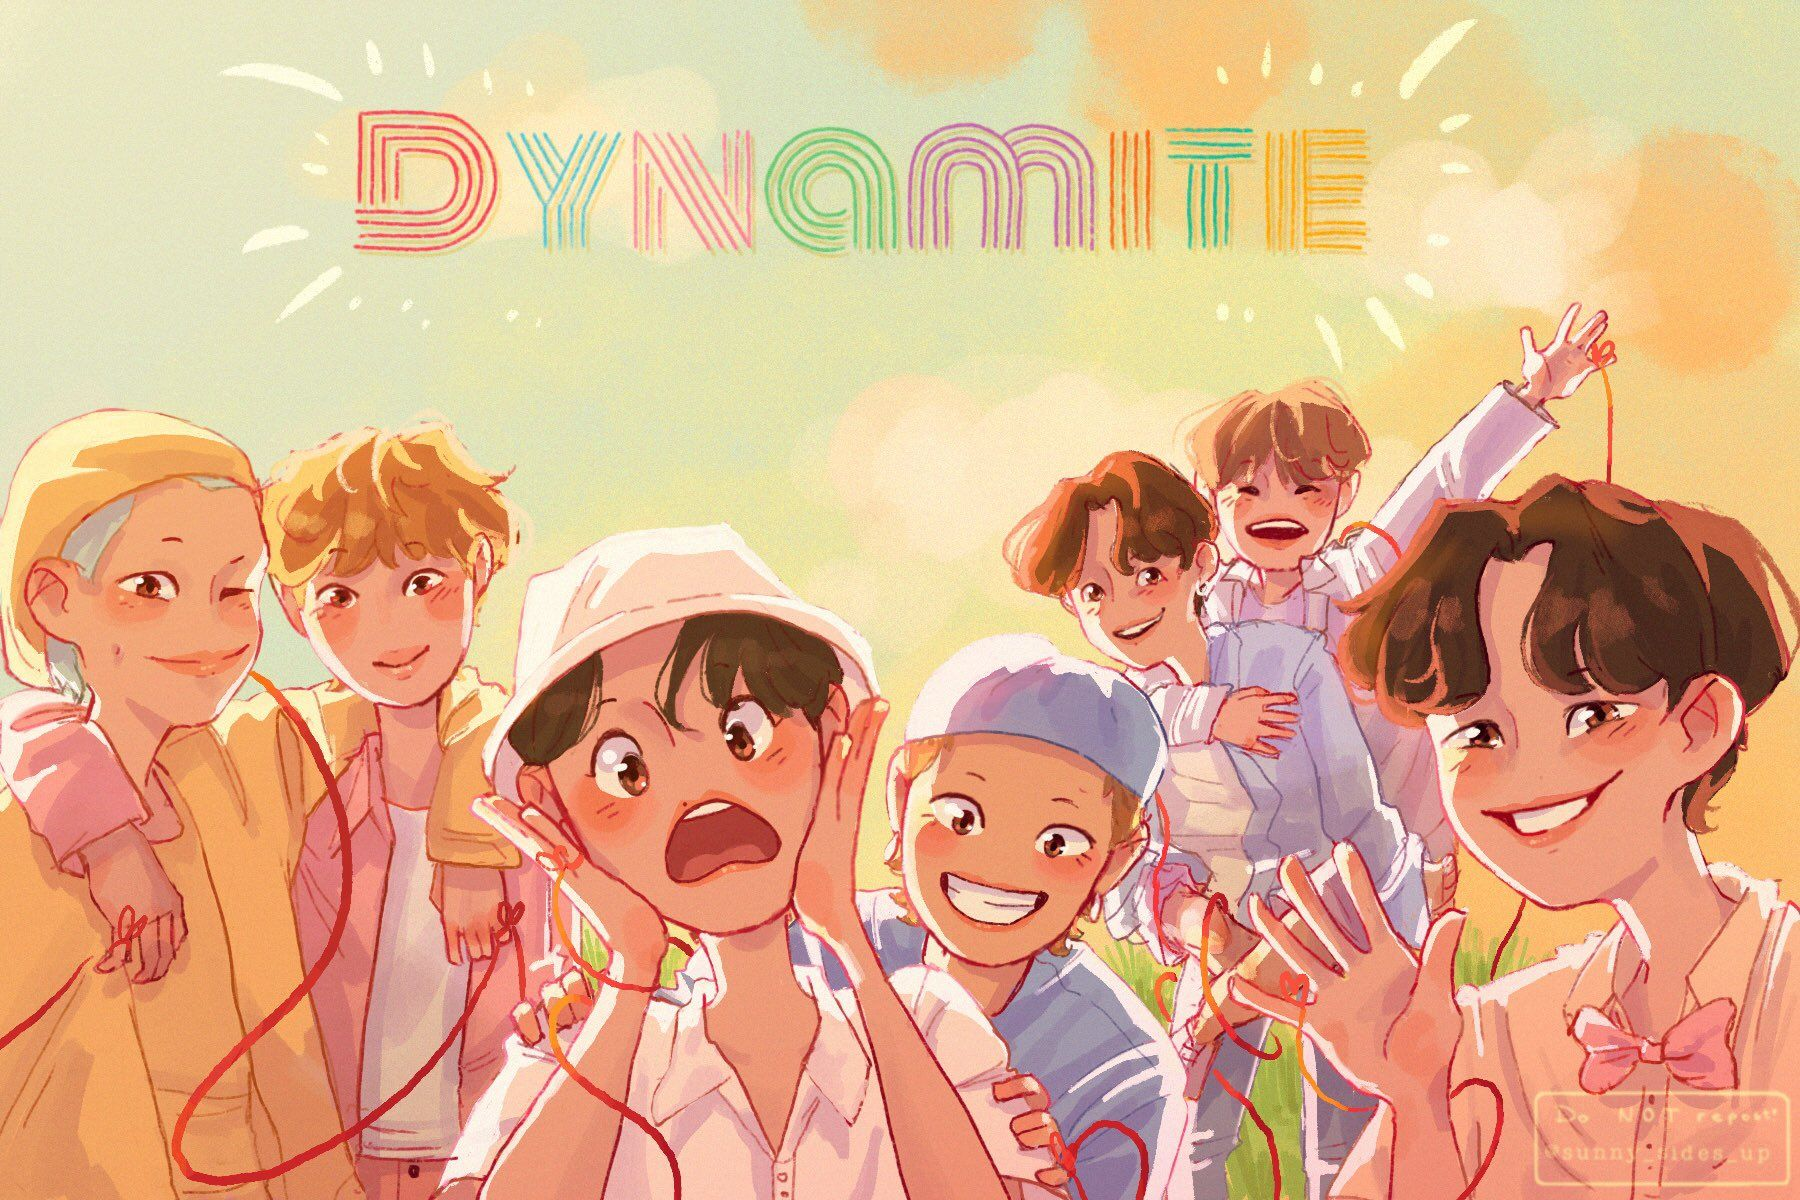 Anpanman Digitalpainting Btsfanart Anpanman Kpop Bts Bts Fanart Bts Drawings Bts Wallpaper